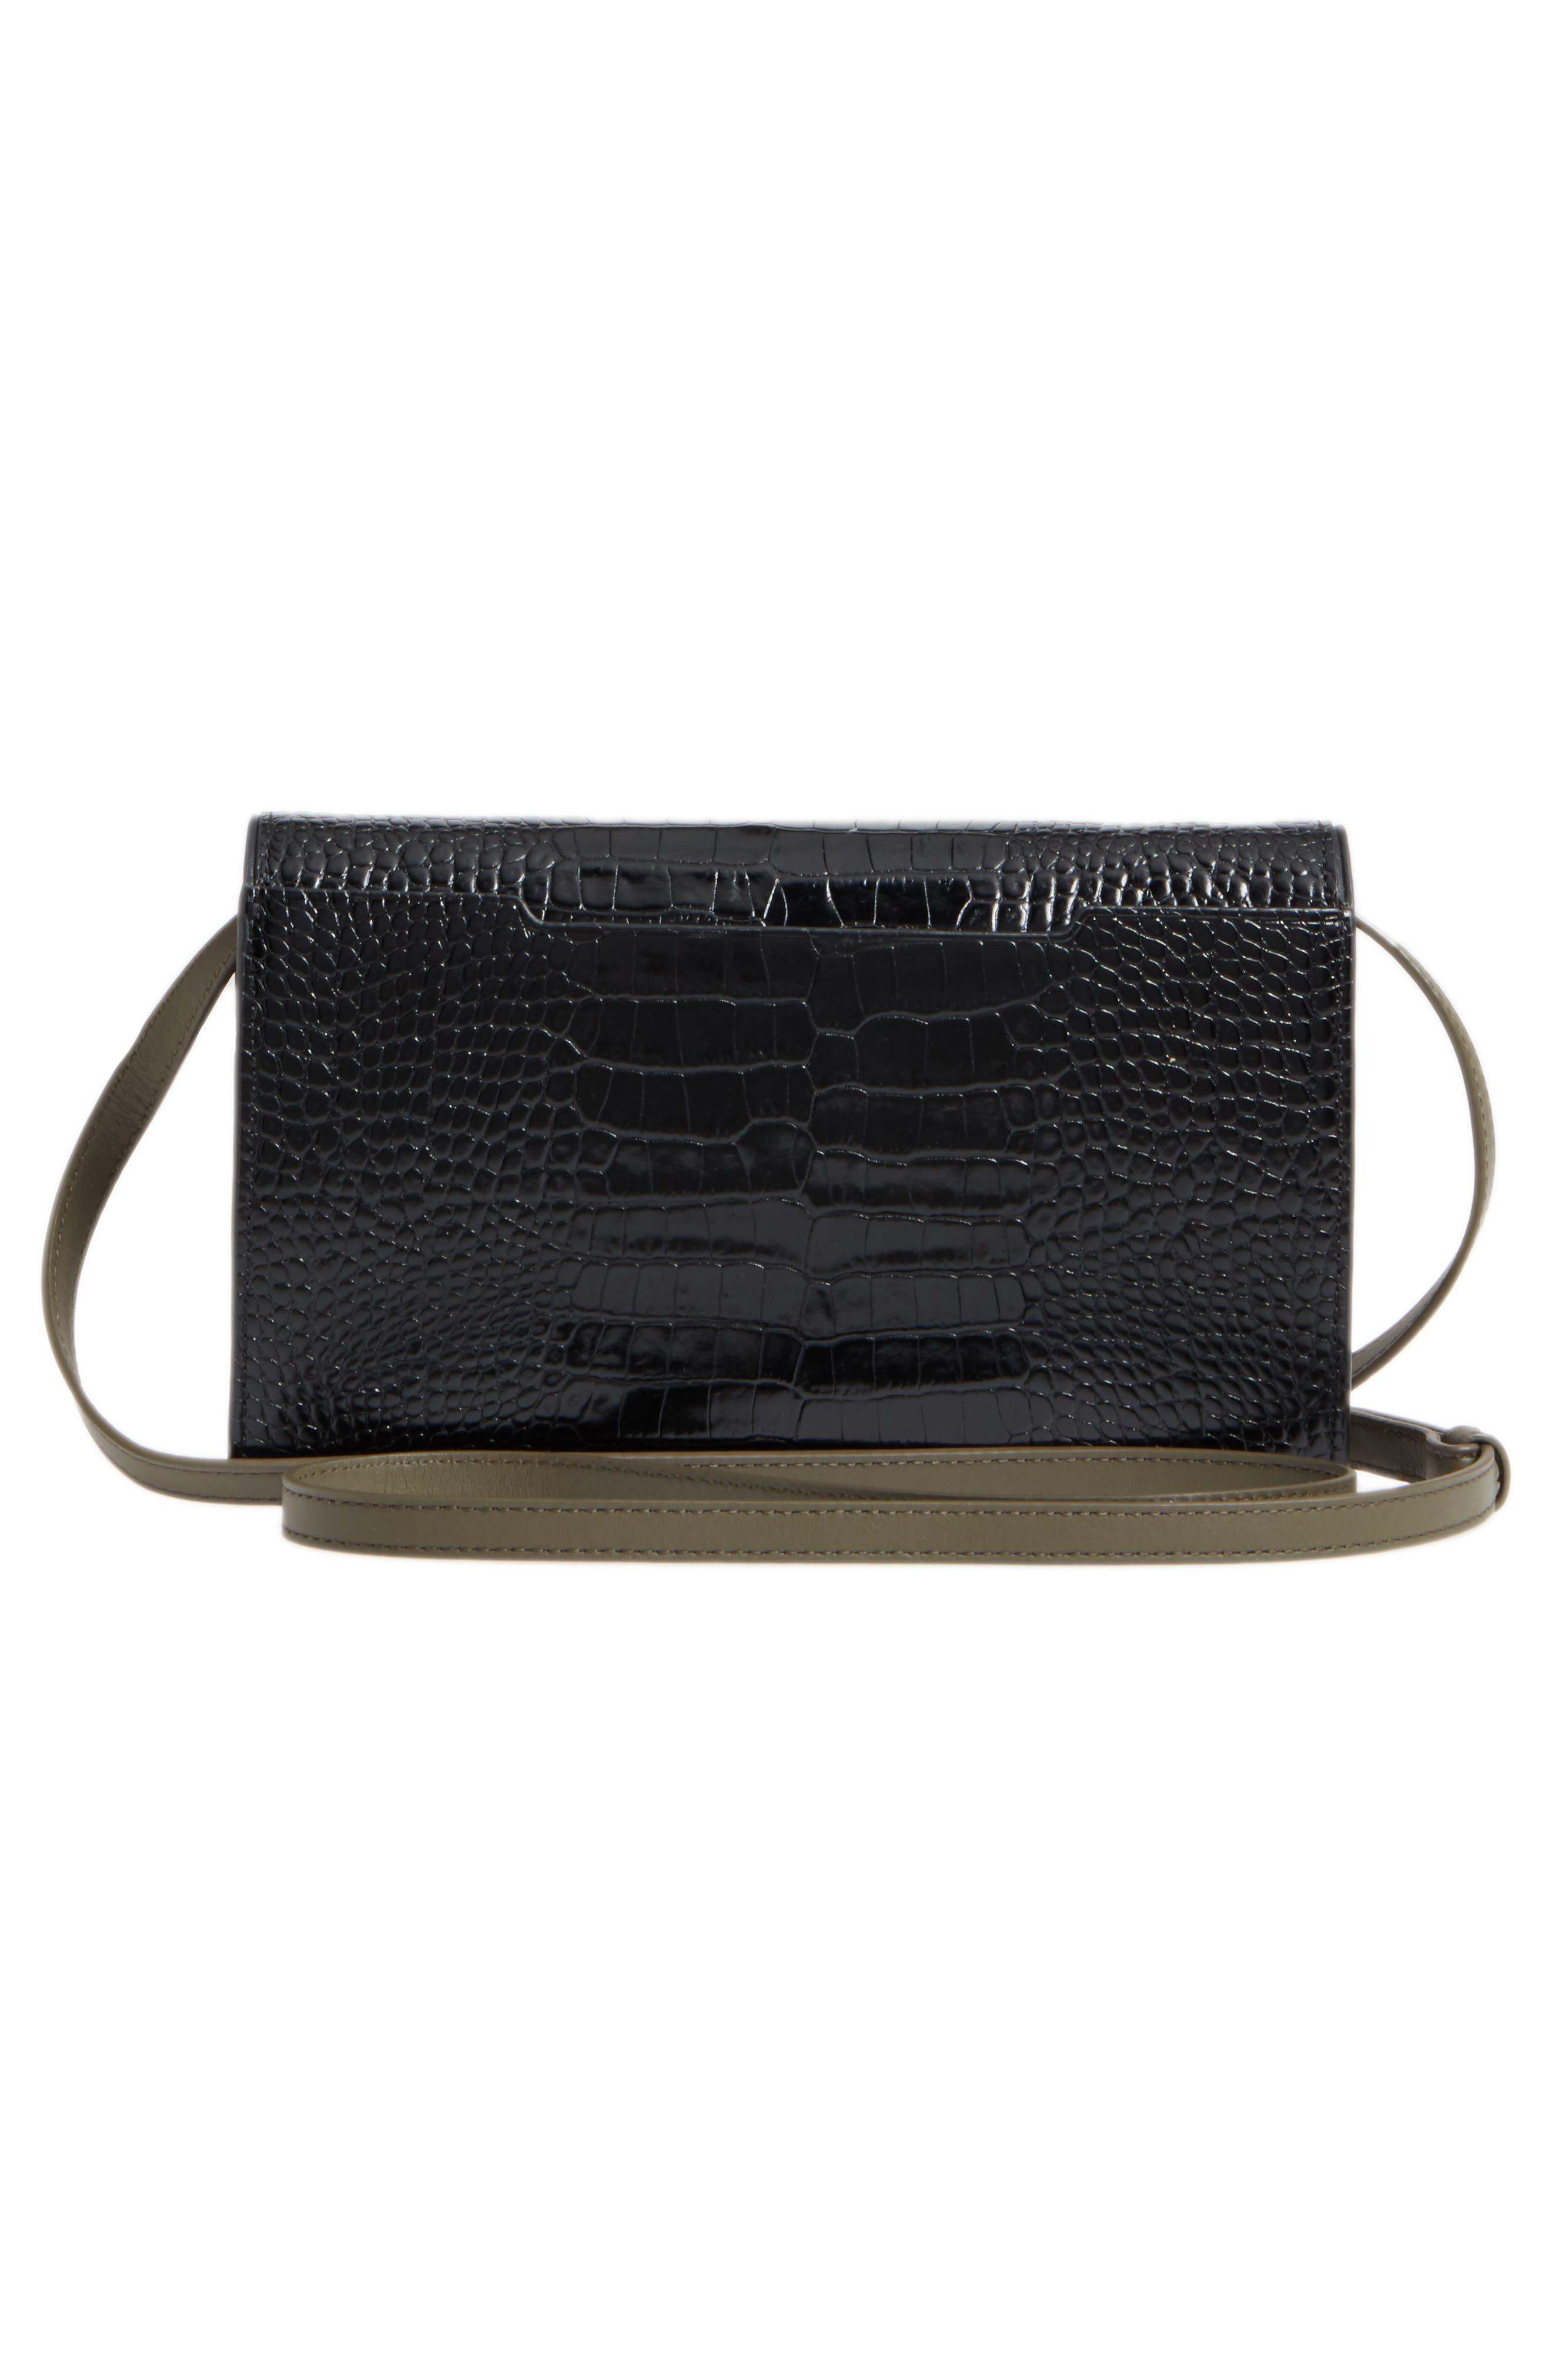 Croc-Embossed Leather Crossbody Wallet,                             Alternate thumbnail 3, color,                             Black Croco